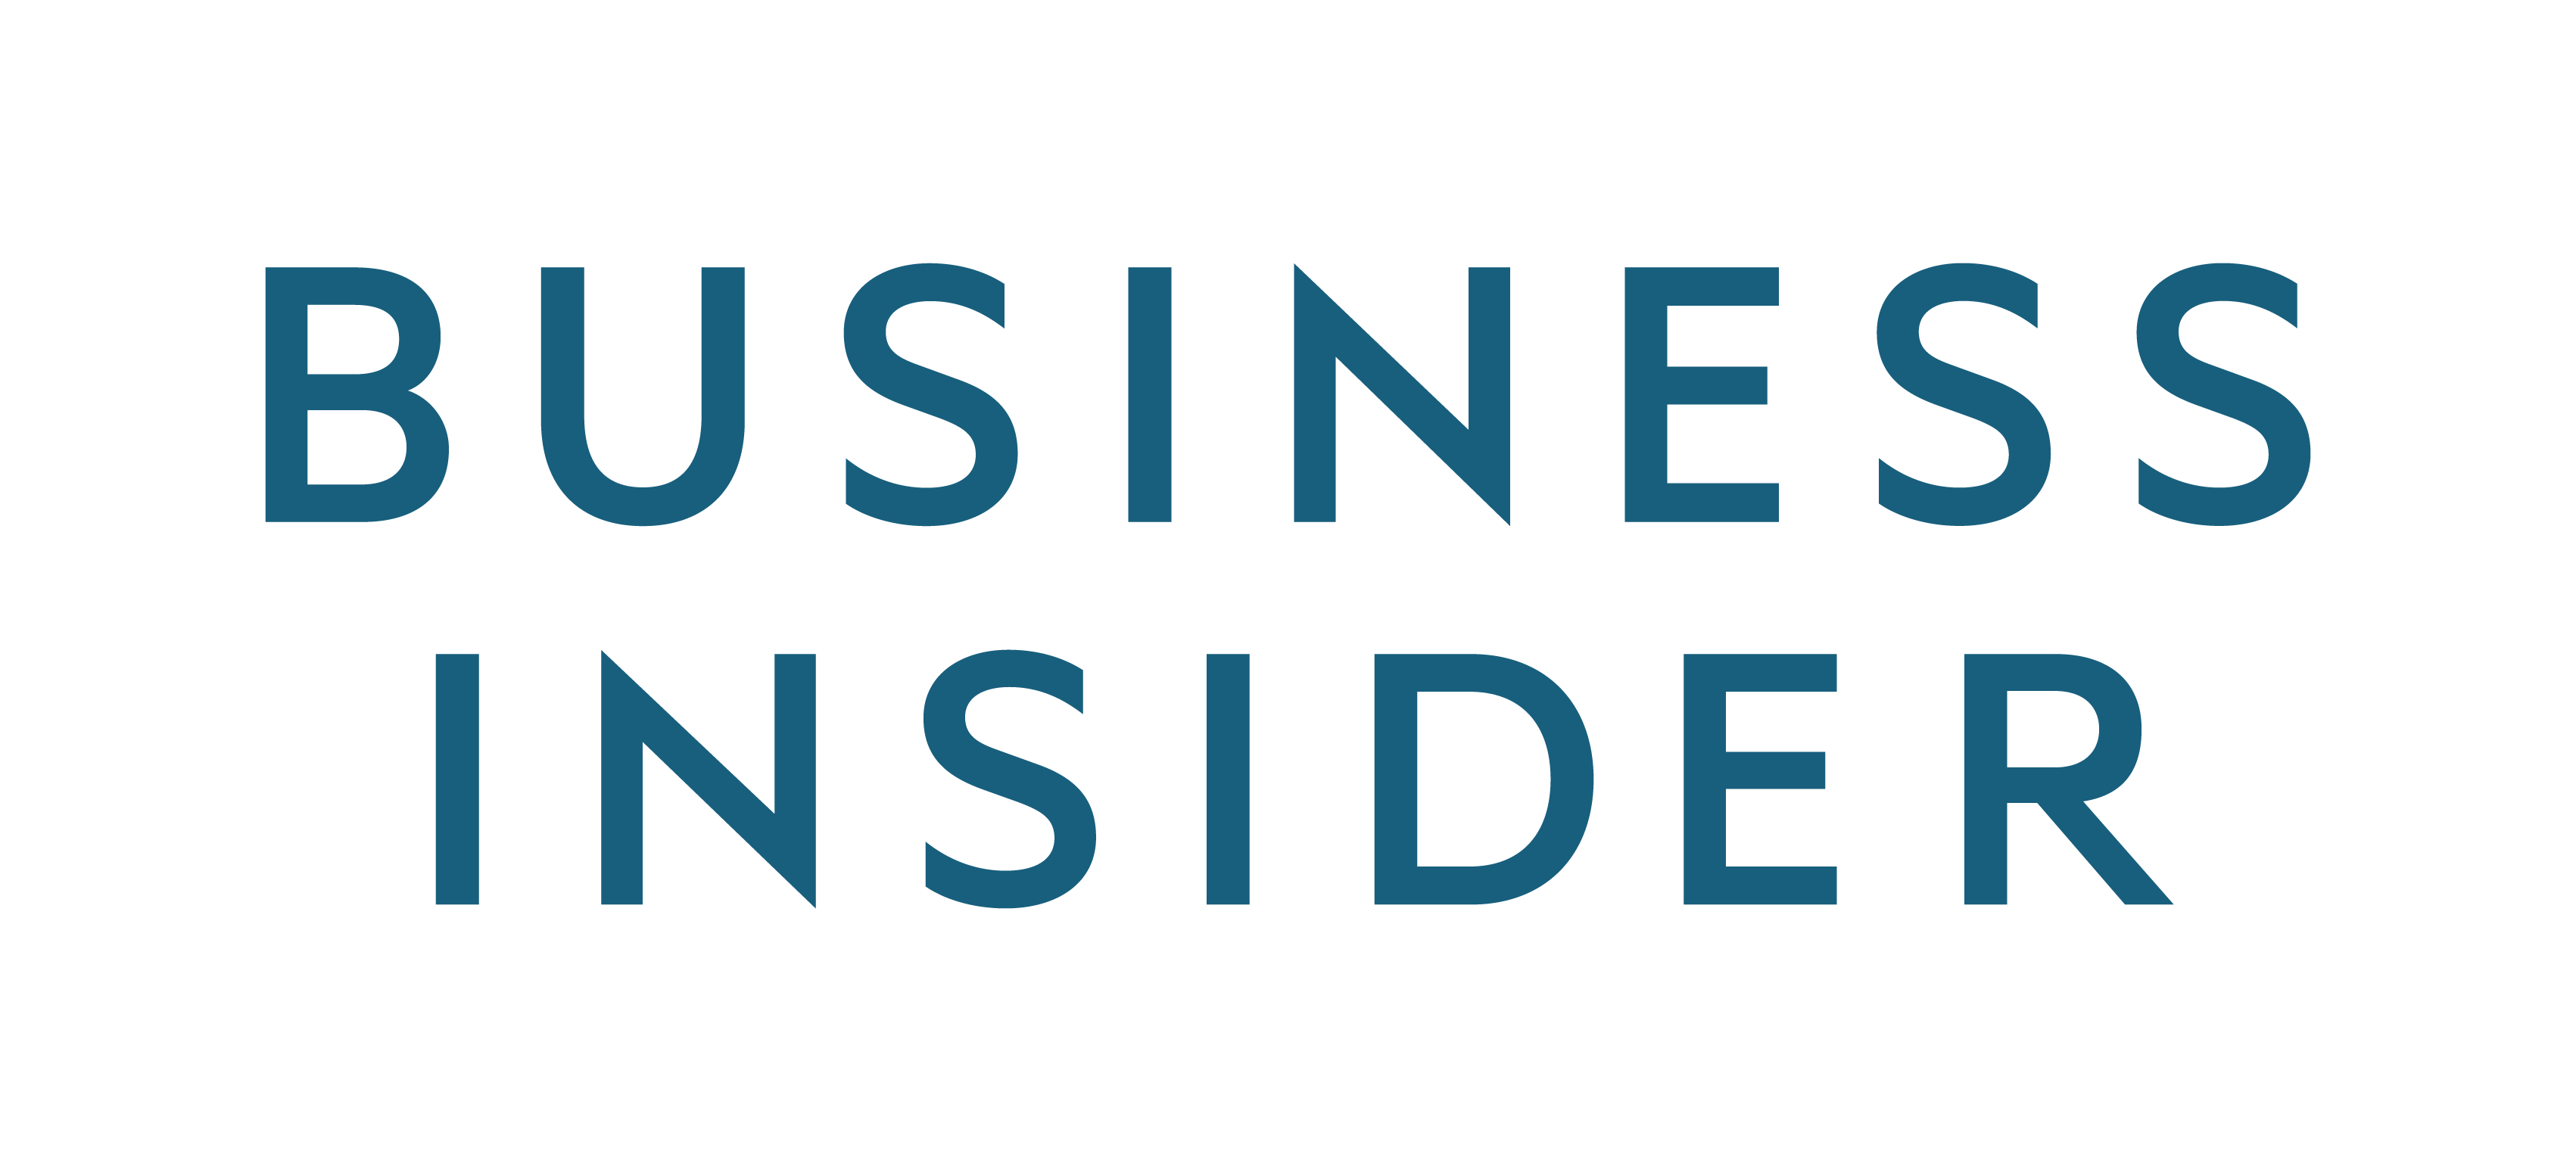 Business insider logos